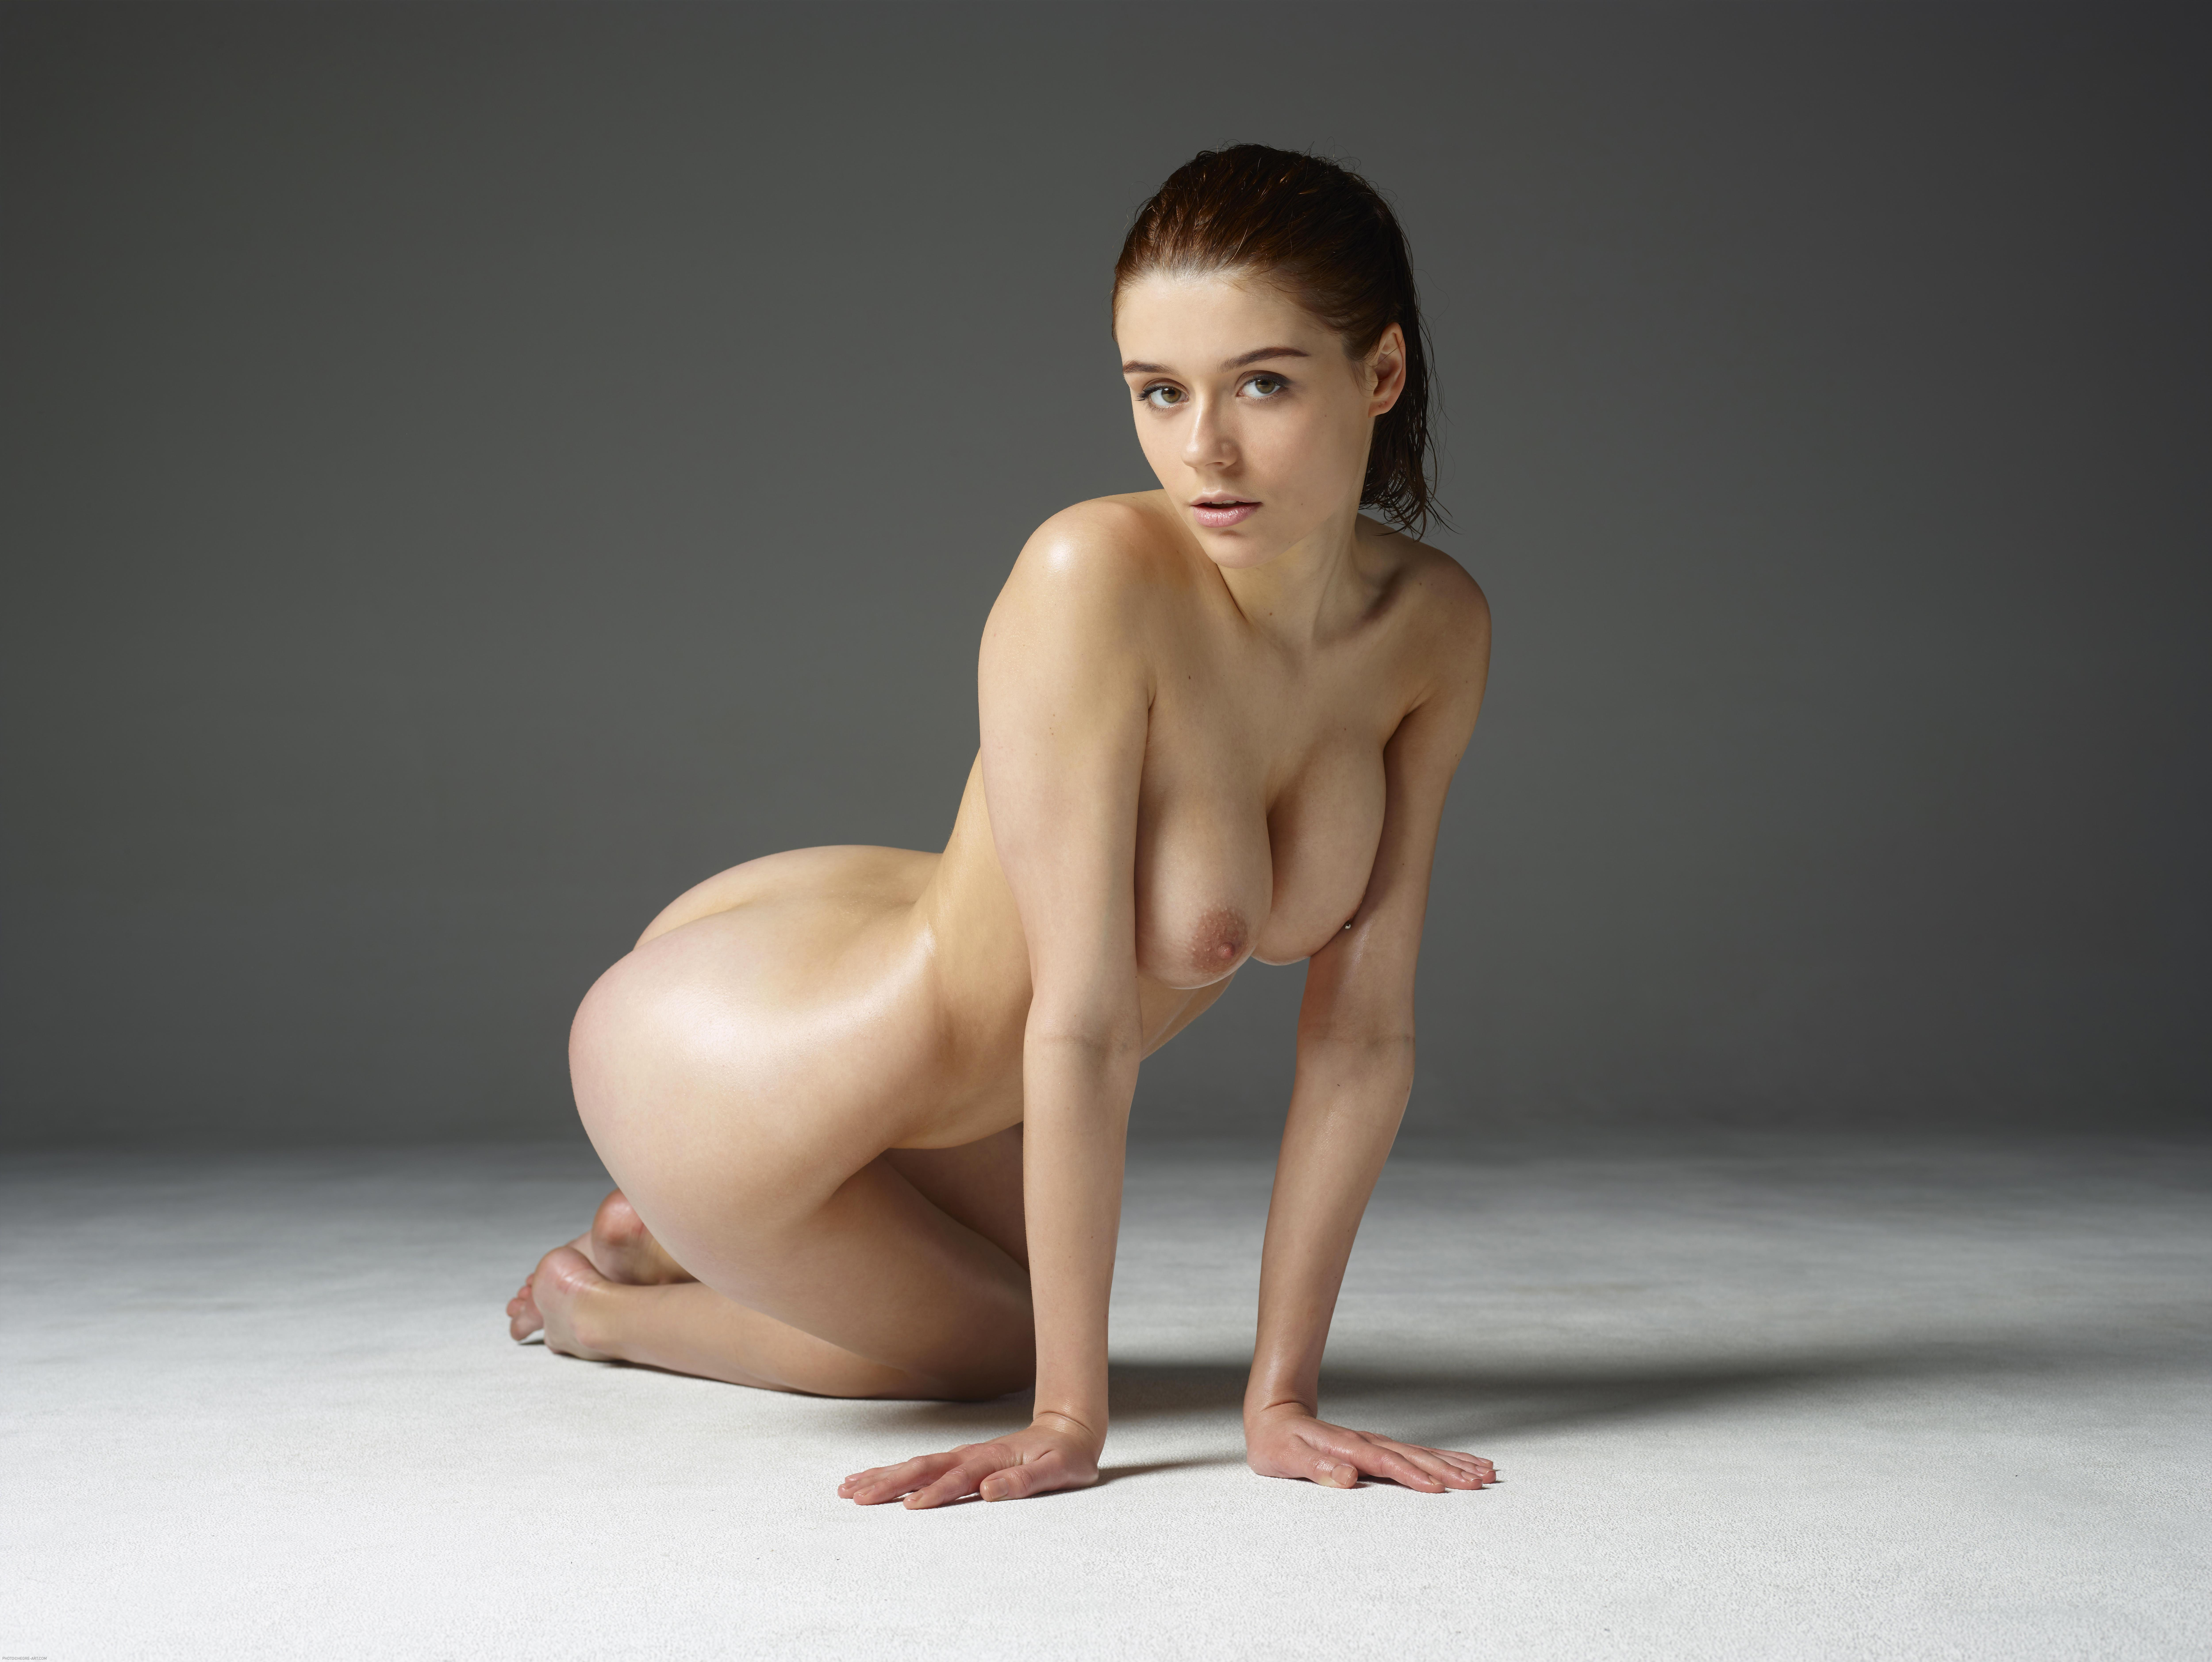 Download Photo 1366X768, Adult Model, Best Quality, Hi-Q, Kloe, Naked -7088